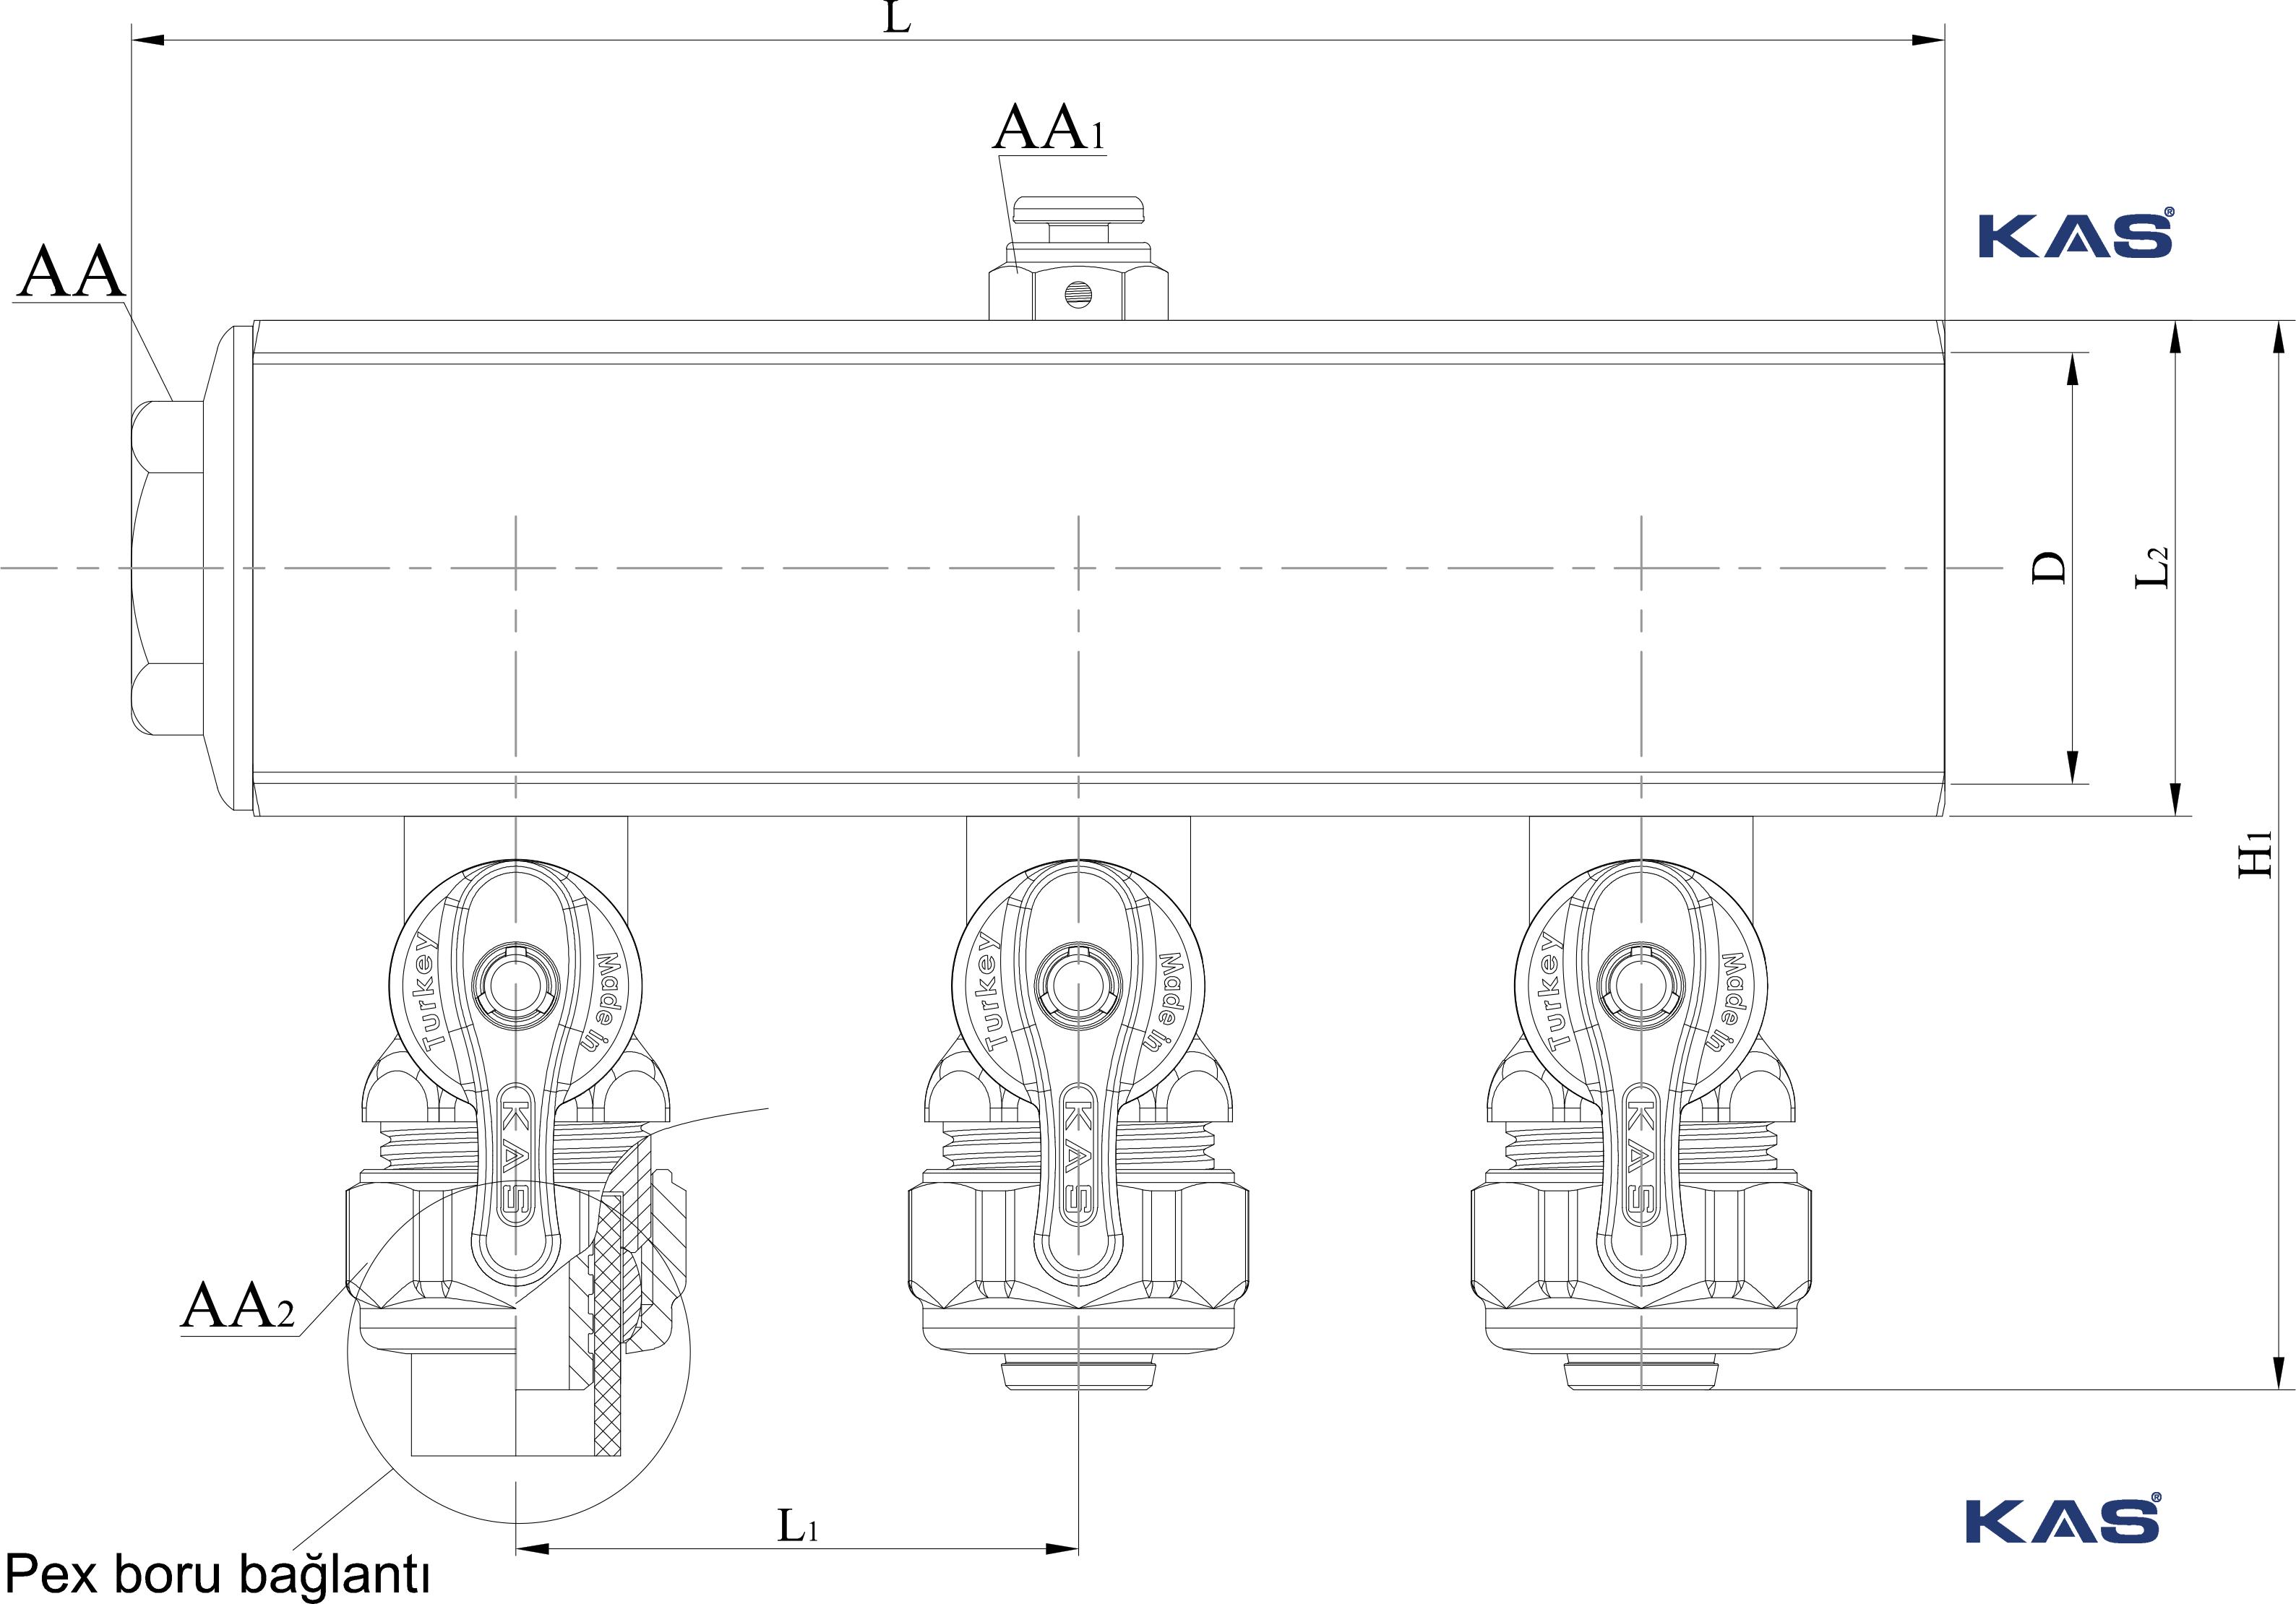 Mini-vanali-kollektor-montaj-resimi